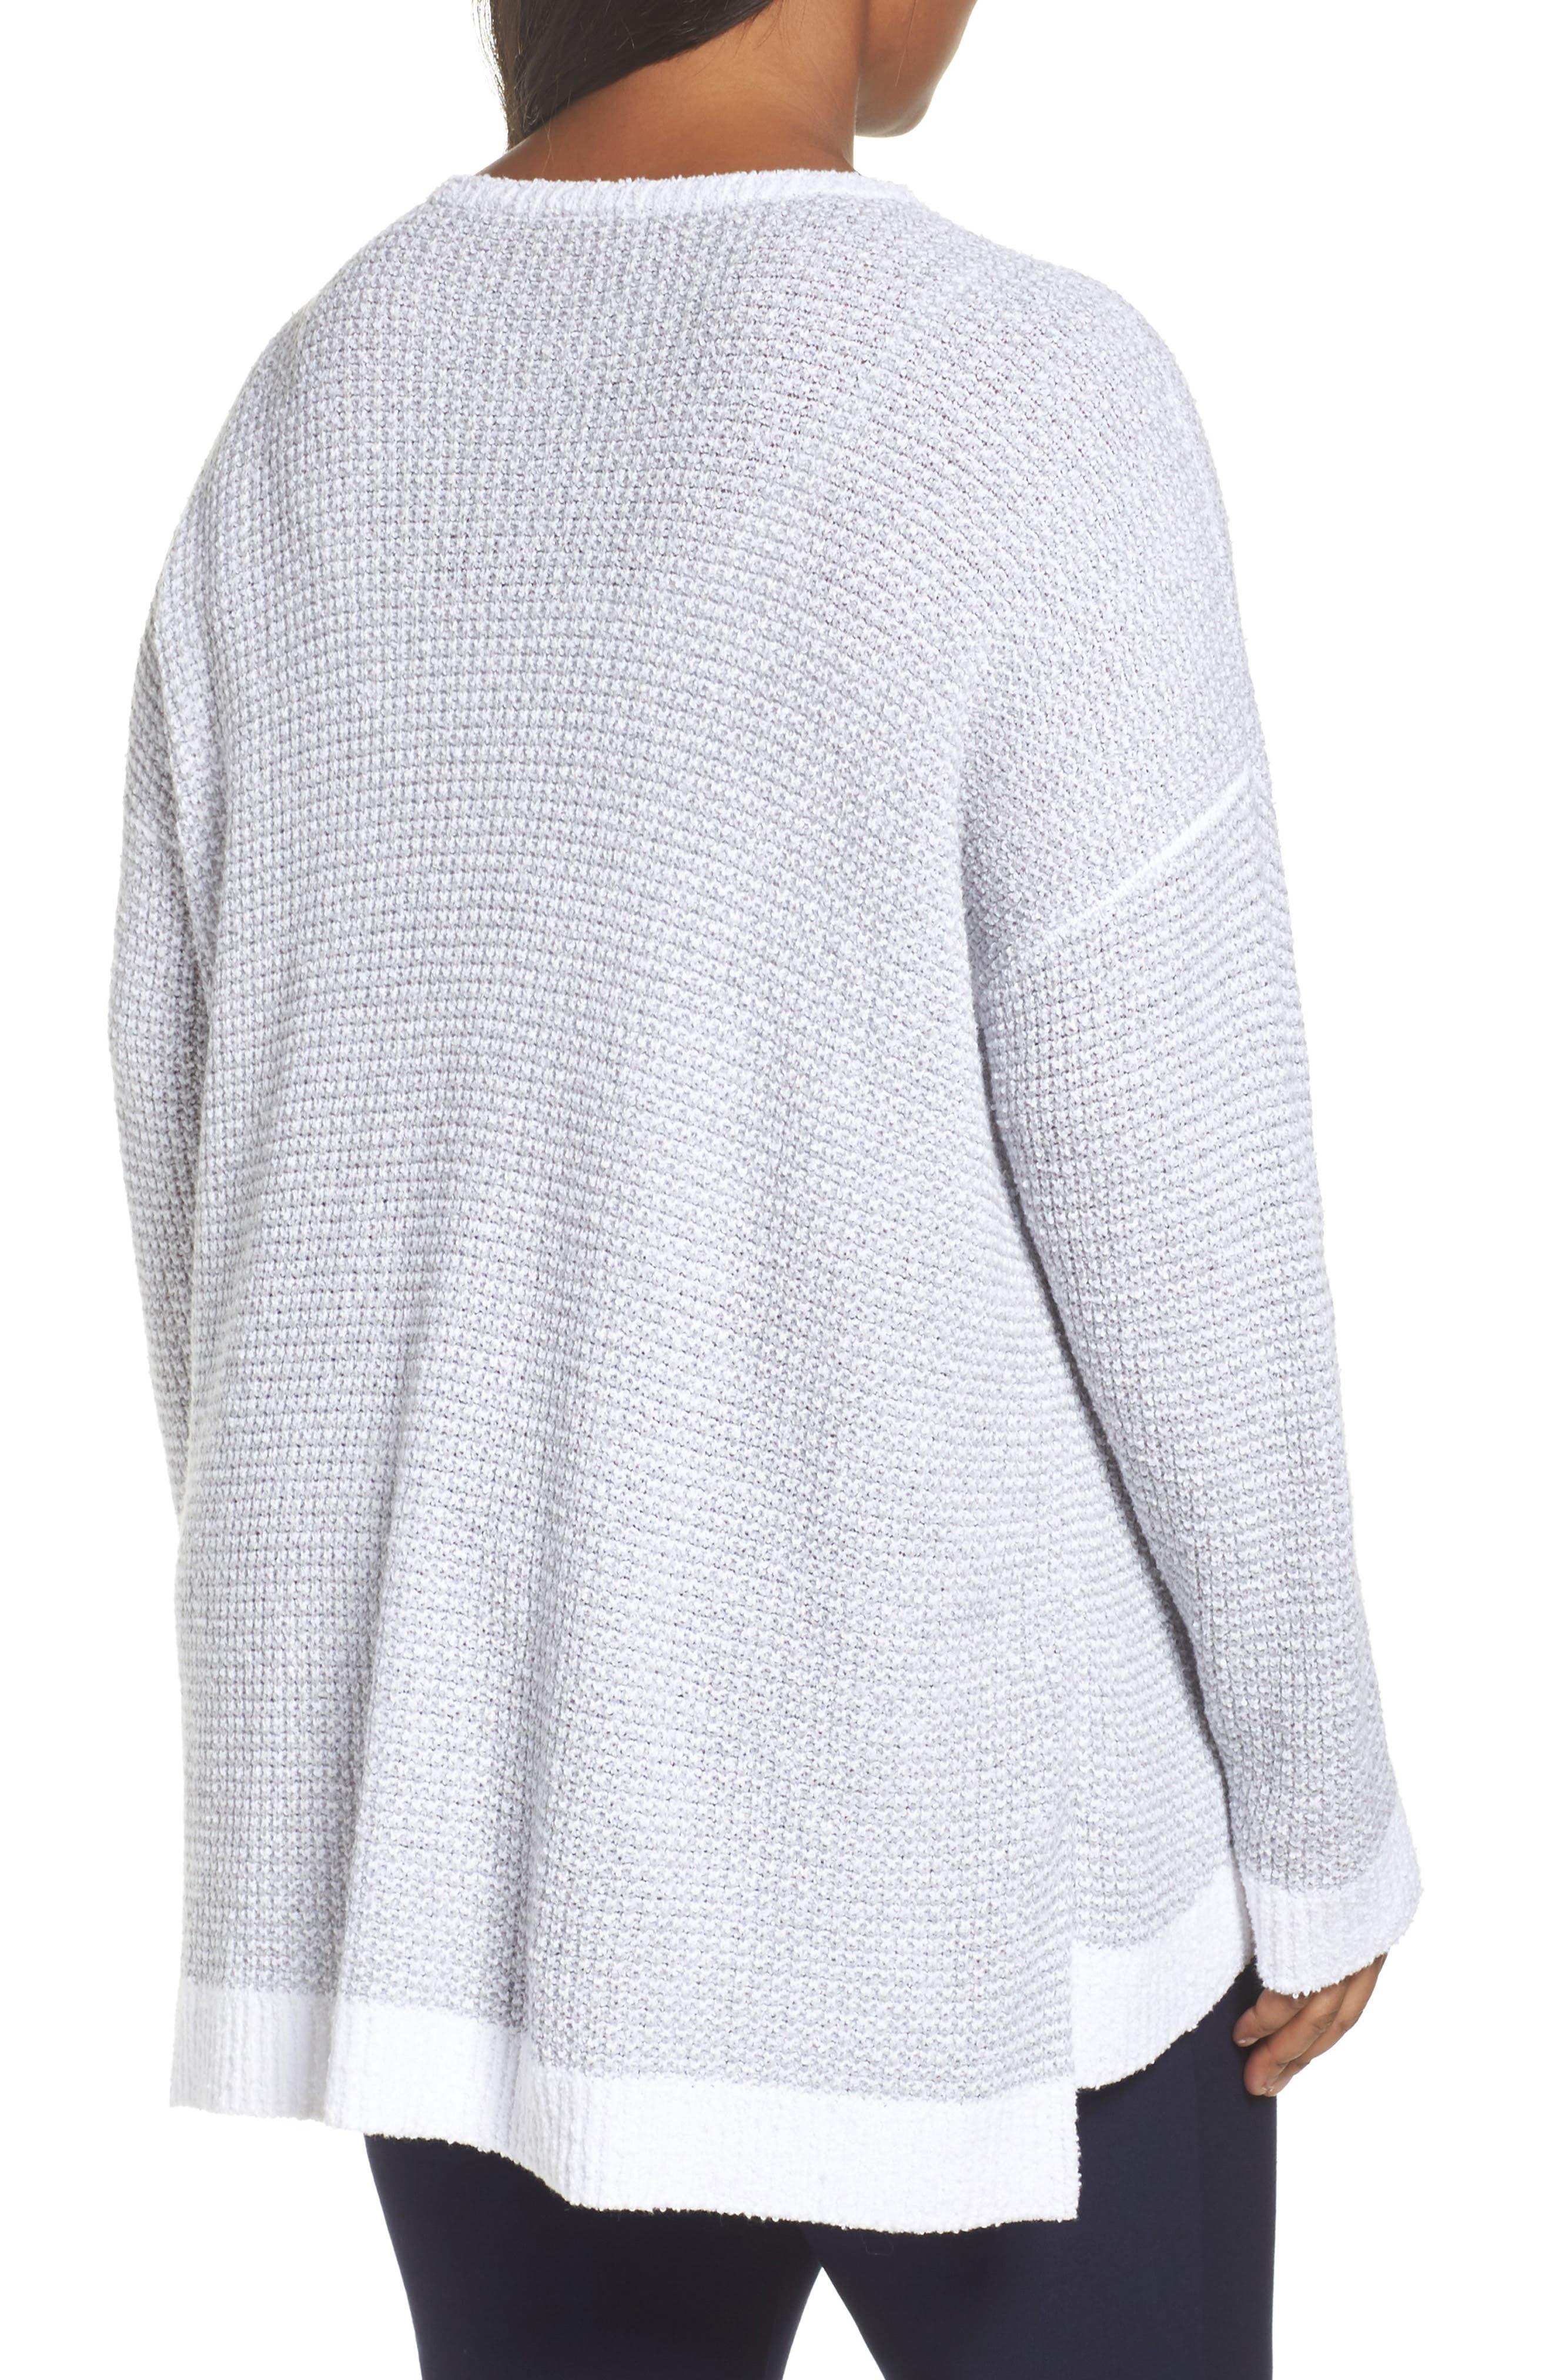 Waffled Organic Cotton Sweater,                             Alternate thumbnail 2, color,                             Grey